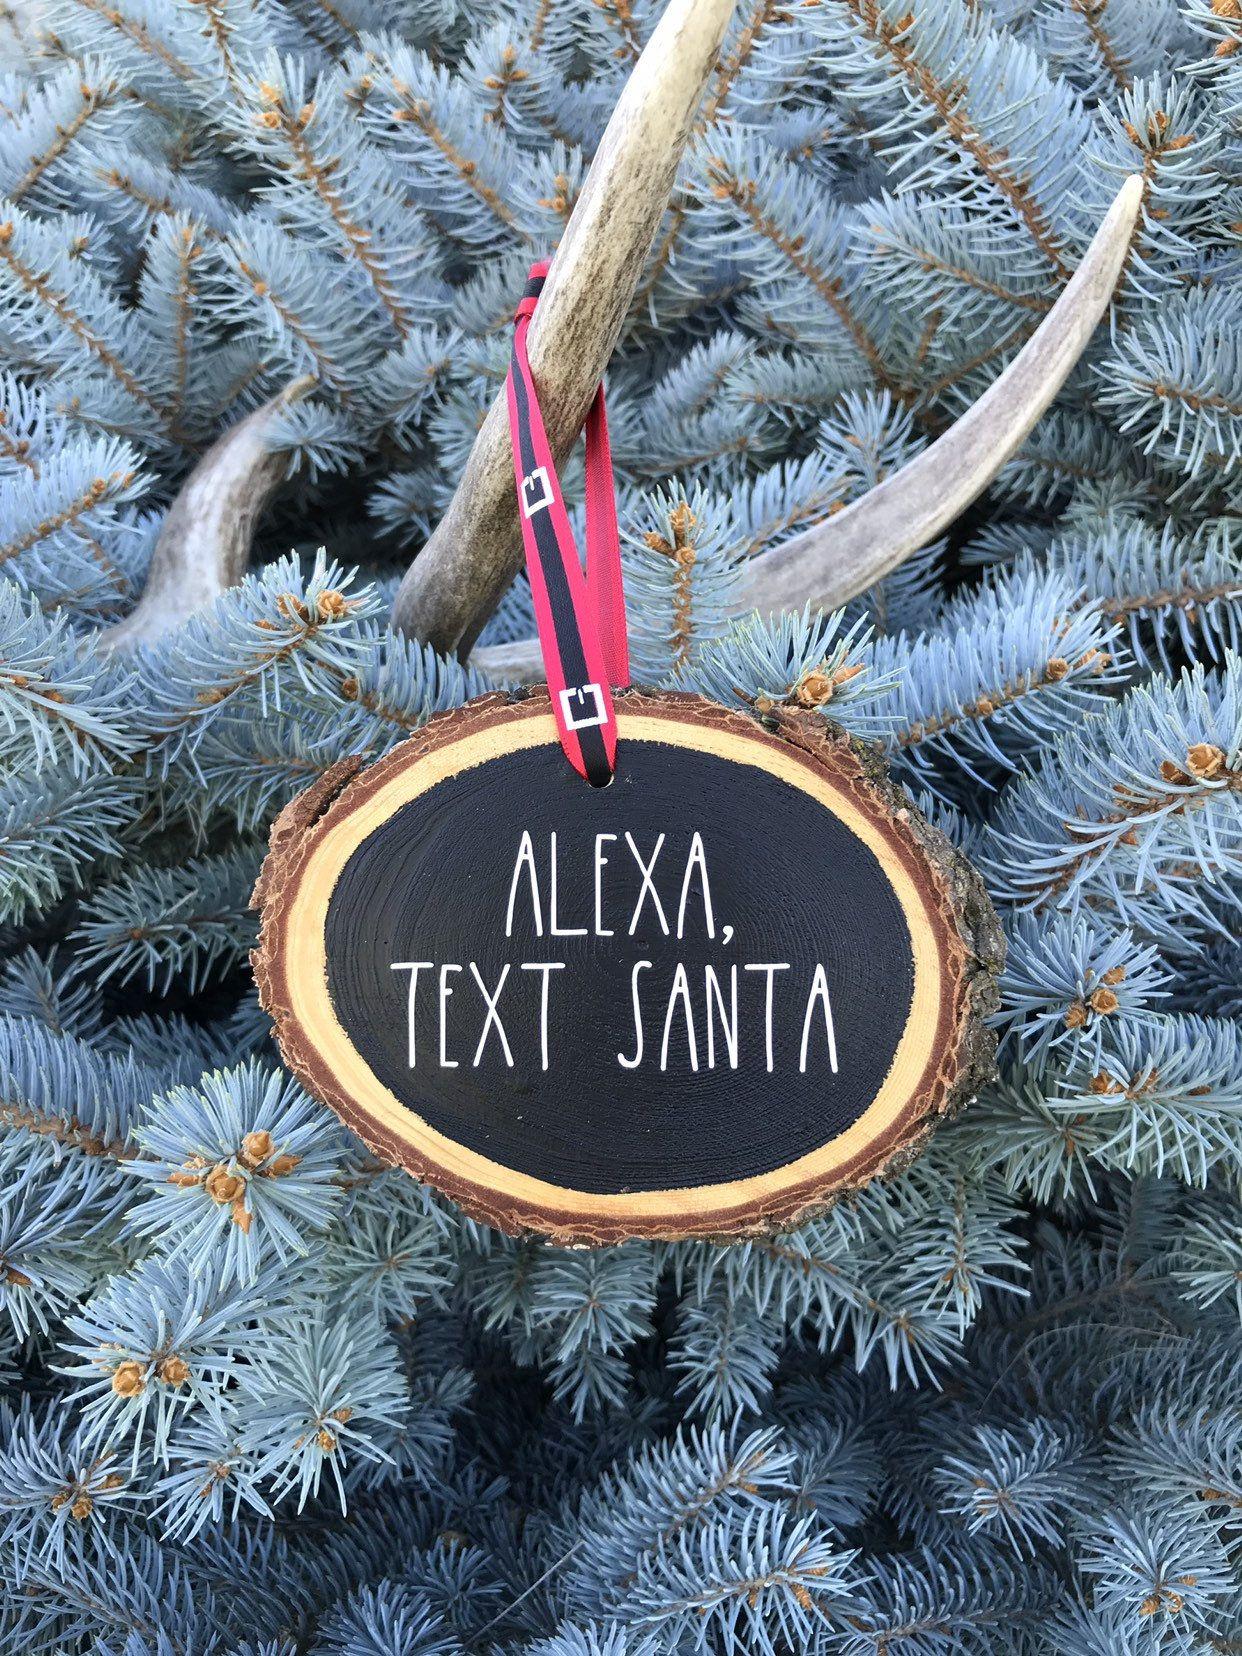 Wood Slice Christmas Ornament Alexa Humor Wooden Slice Etsy Christmas Ornaments Wood Slices Handmade Christmas Ornaments